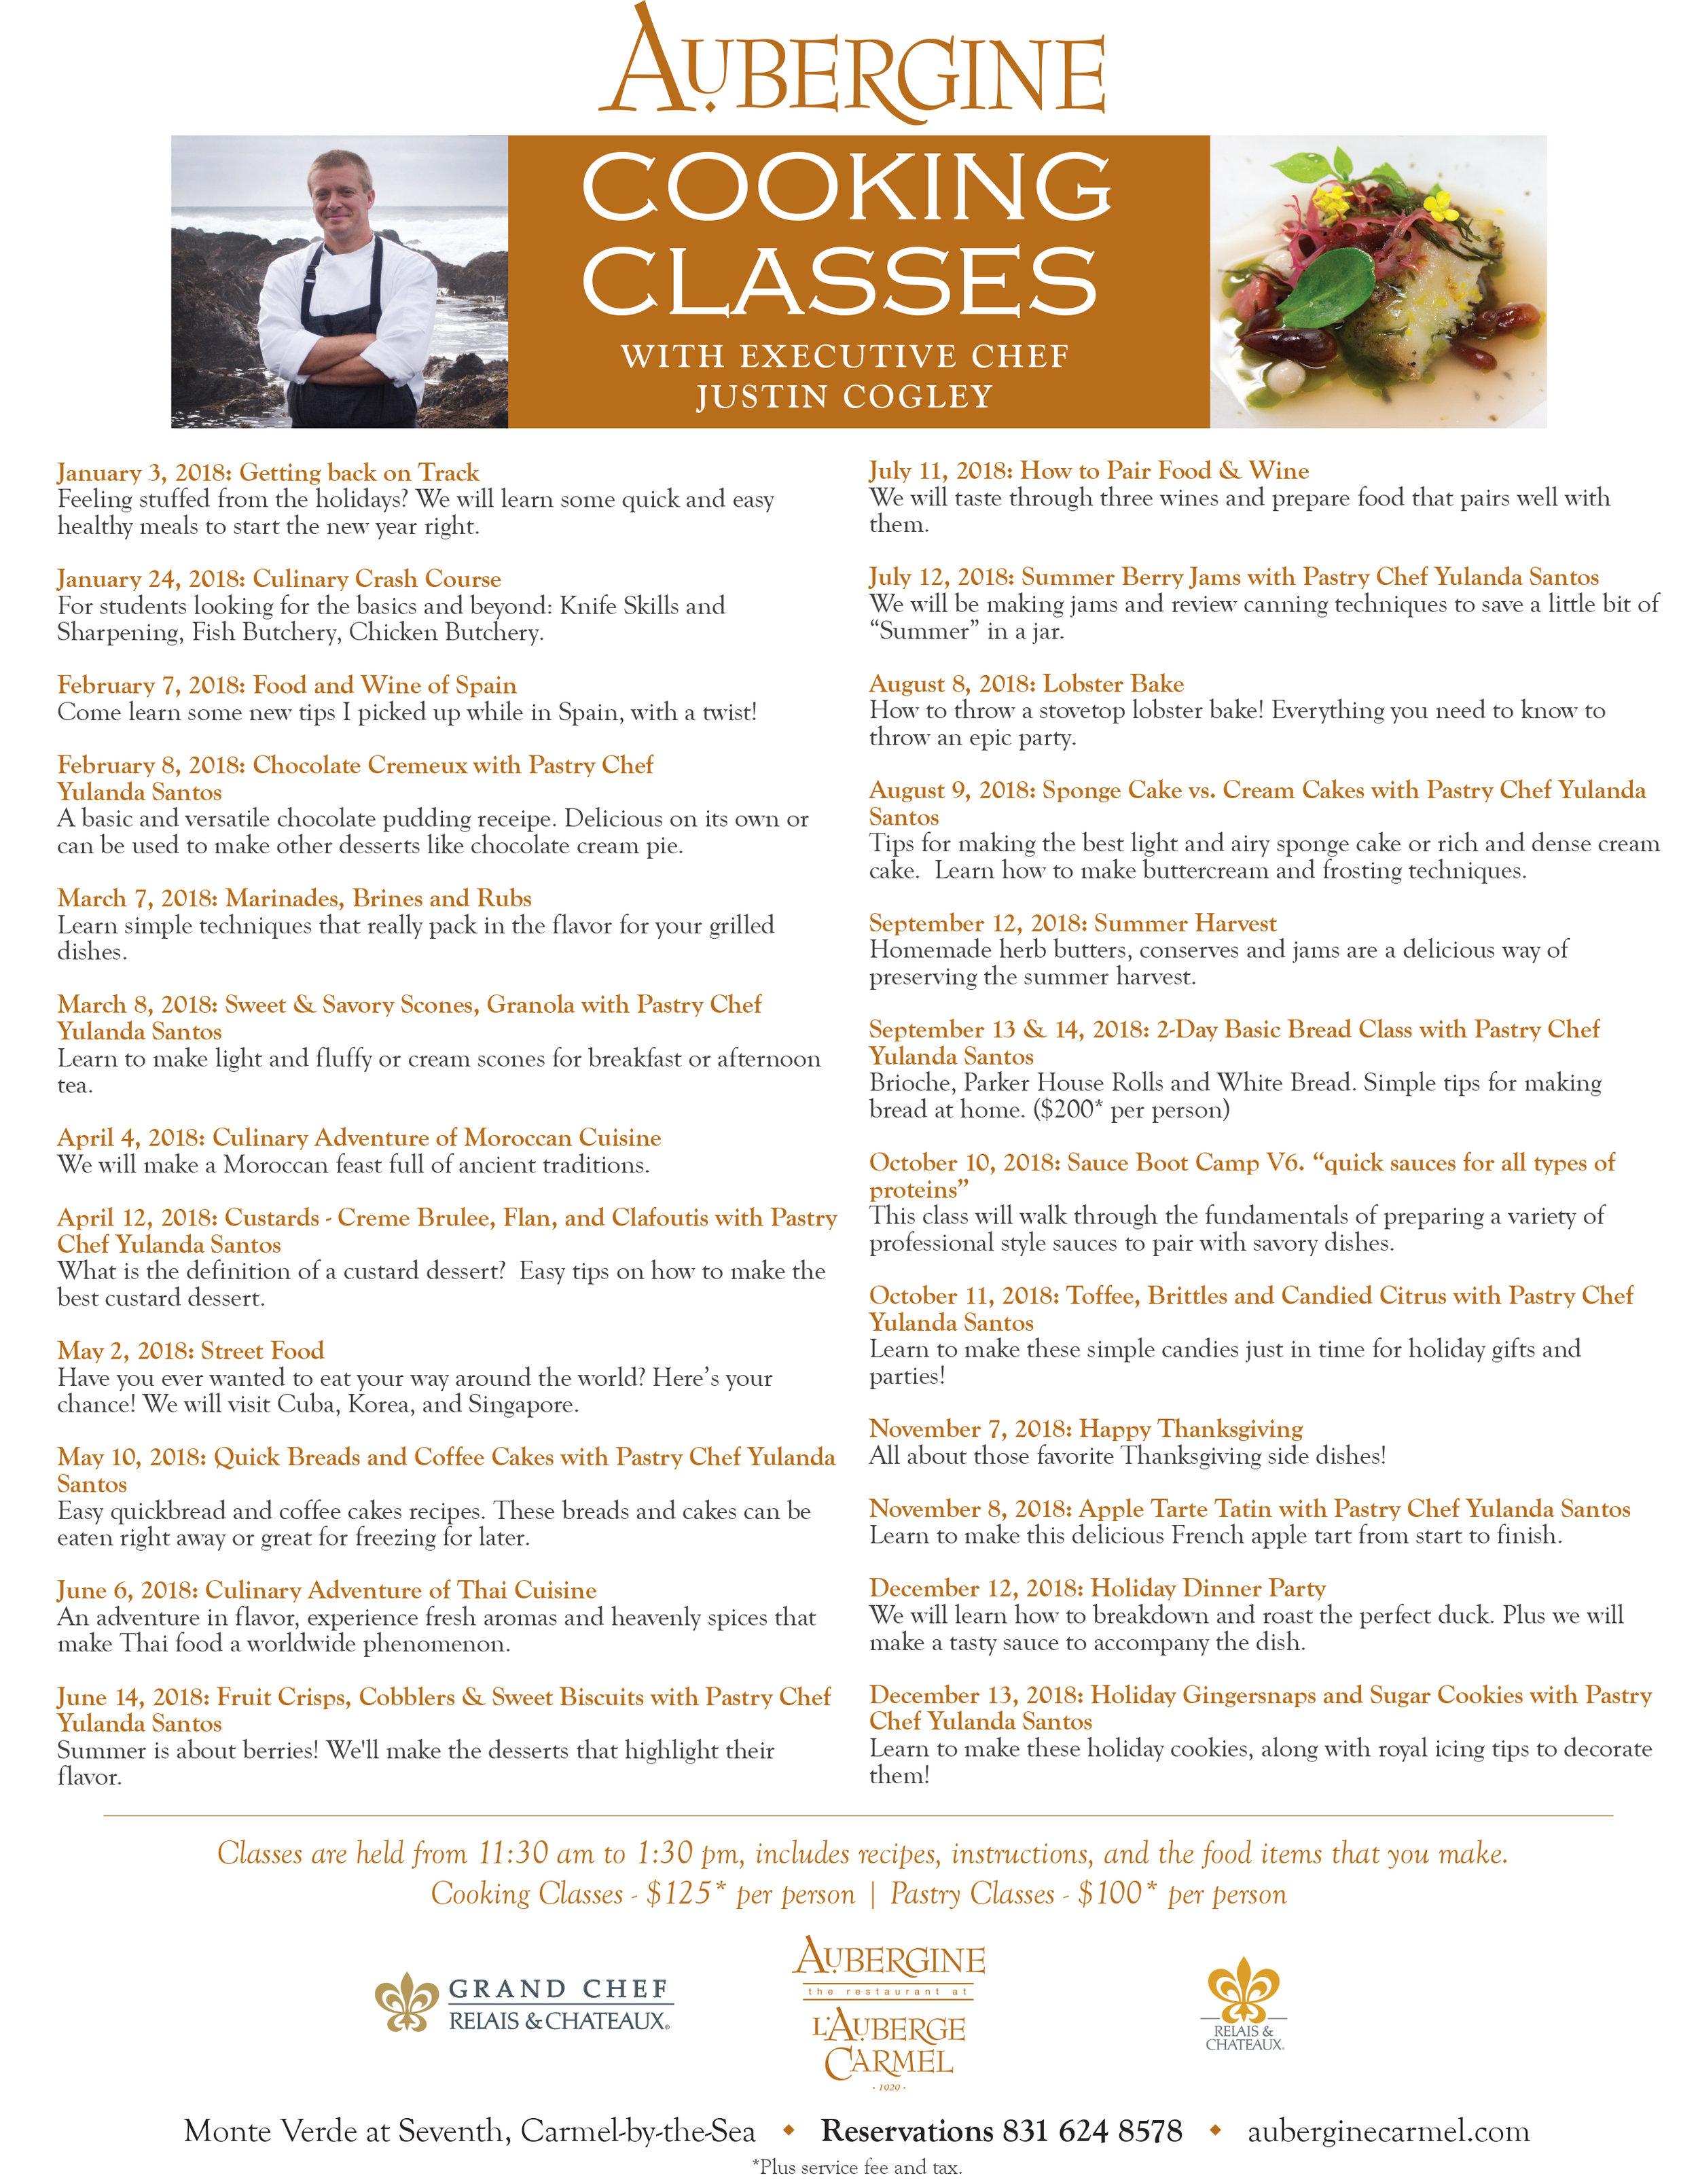 Aubergine Cooking Classes 2018.jpg